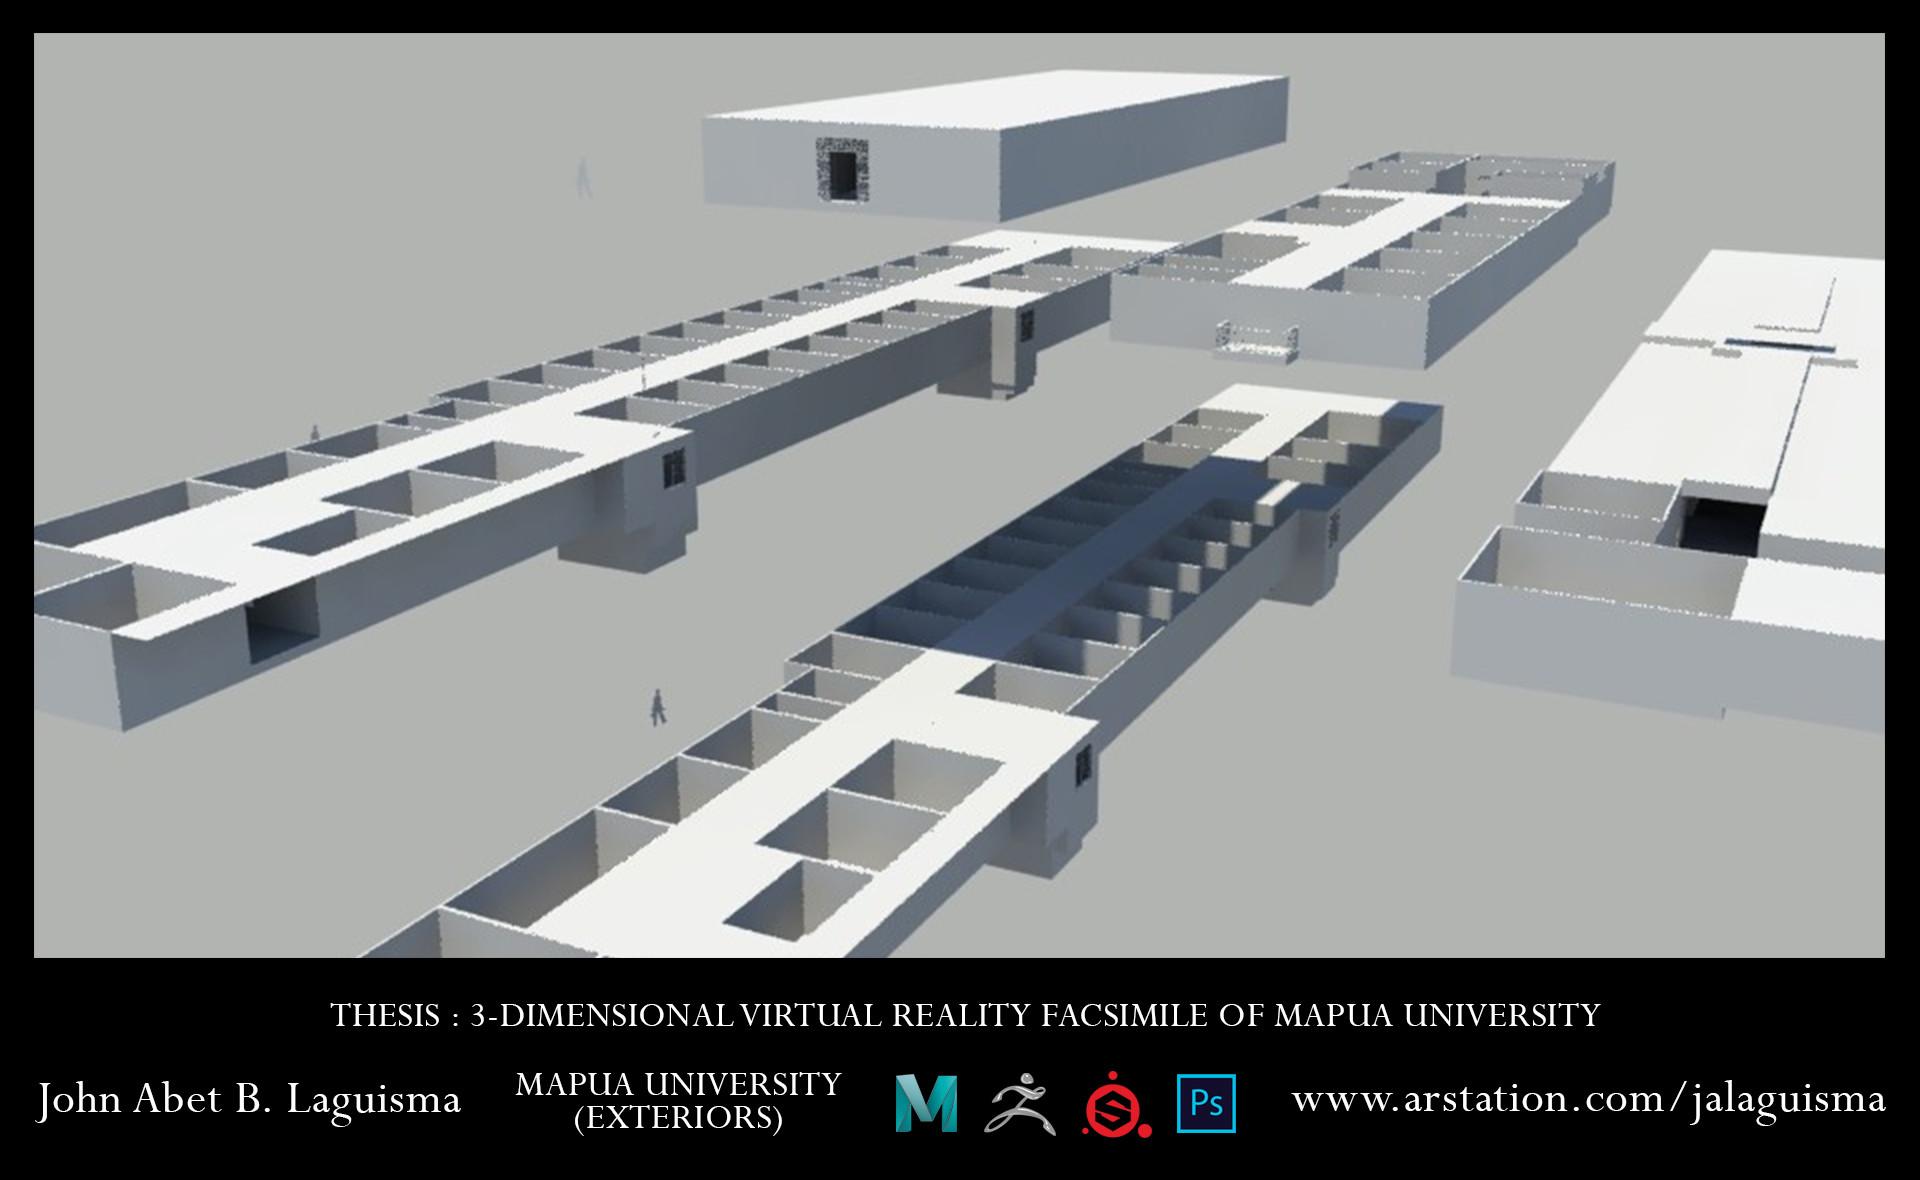 mapua thesis architecture